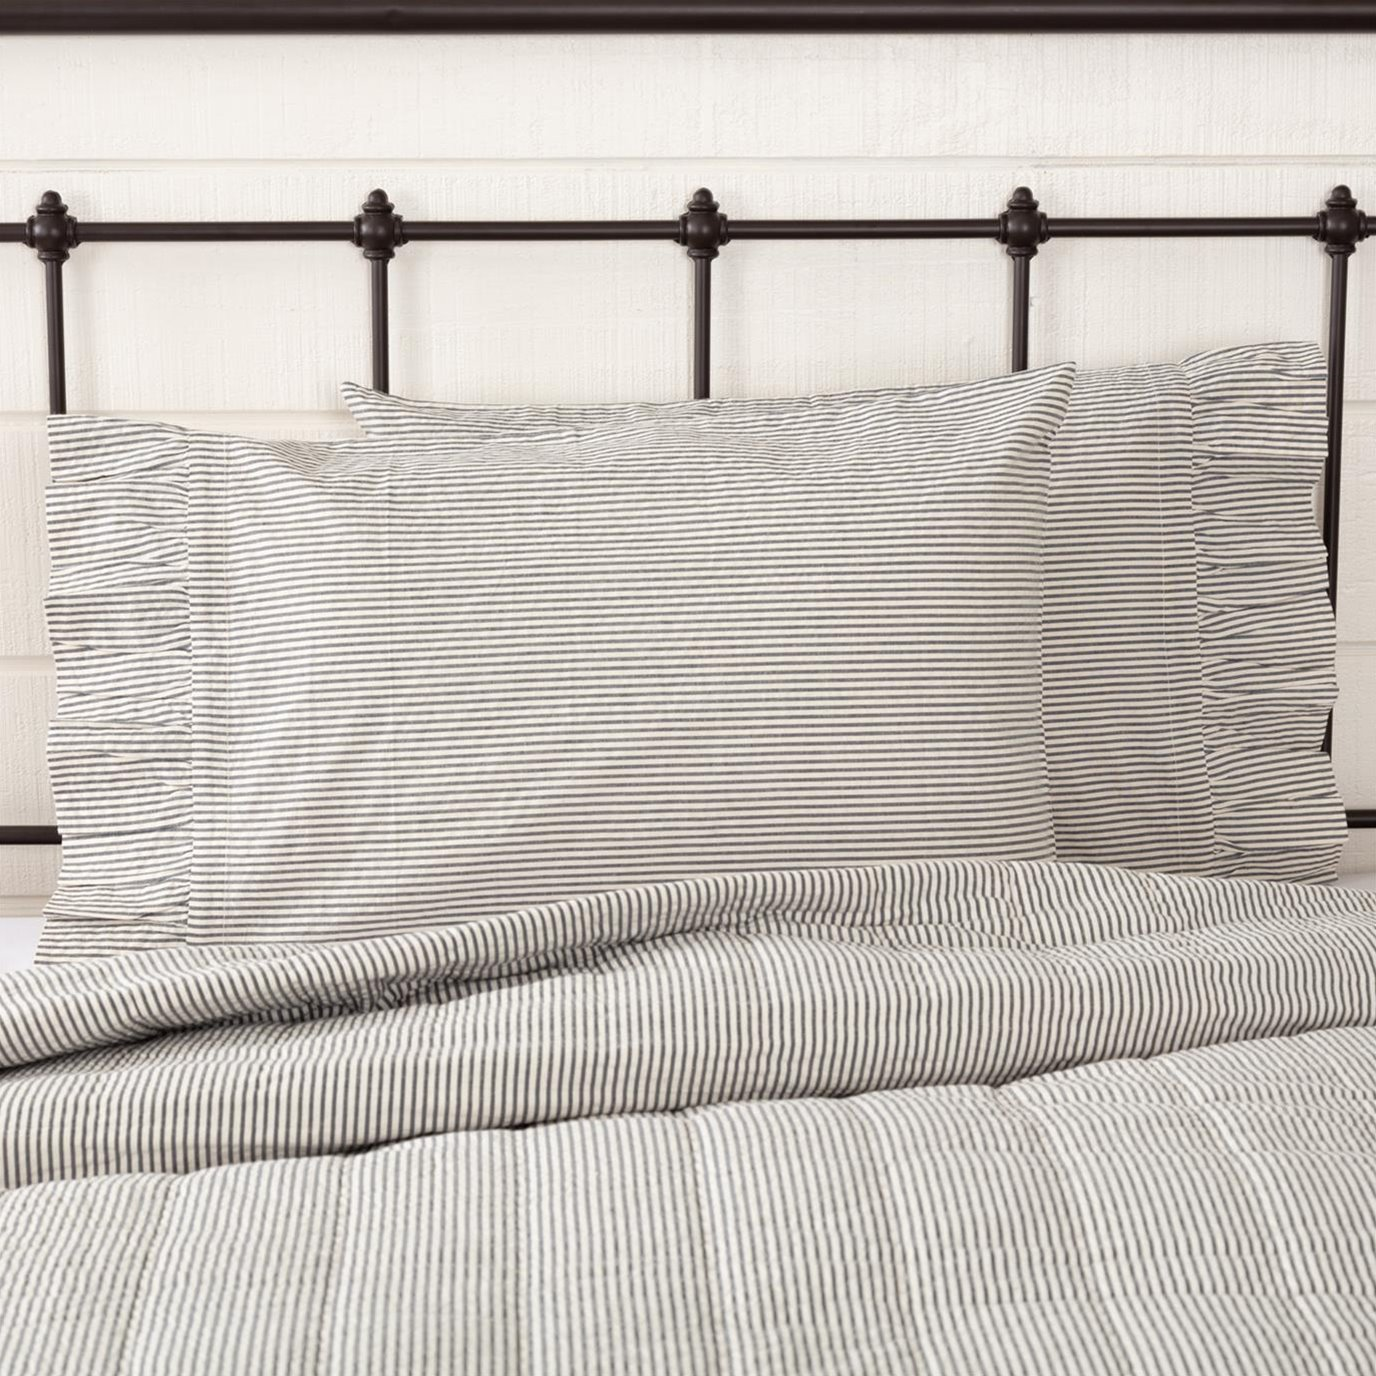 Hatteras Seersucker Blue Ticking Stripe Standard Pillow Case Set of 2 21x30